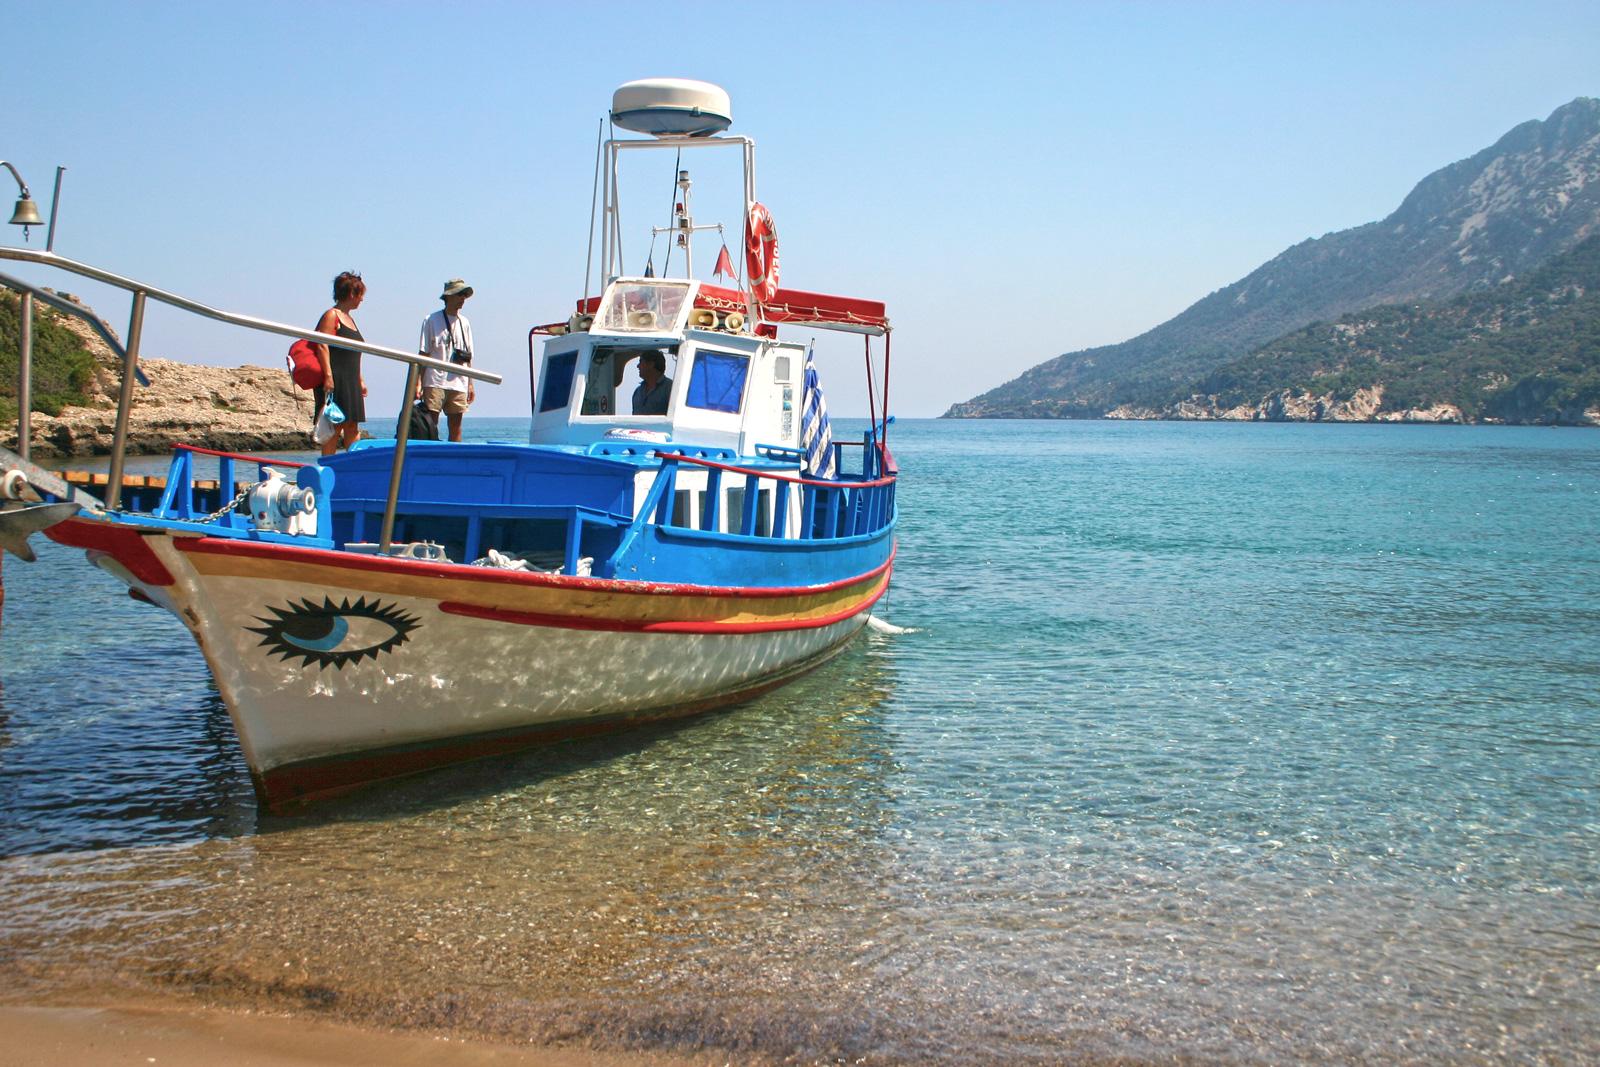 Explore the beaches in Samos